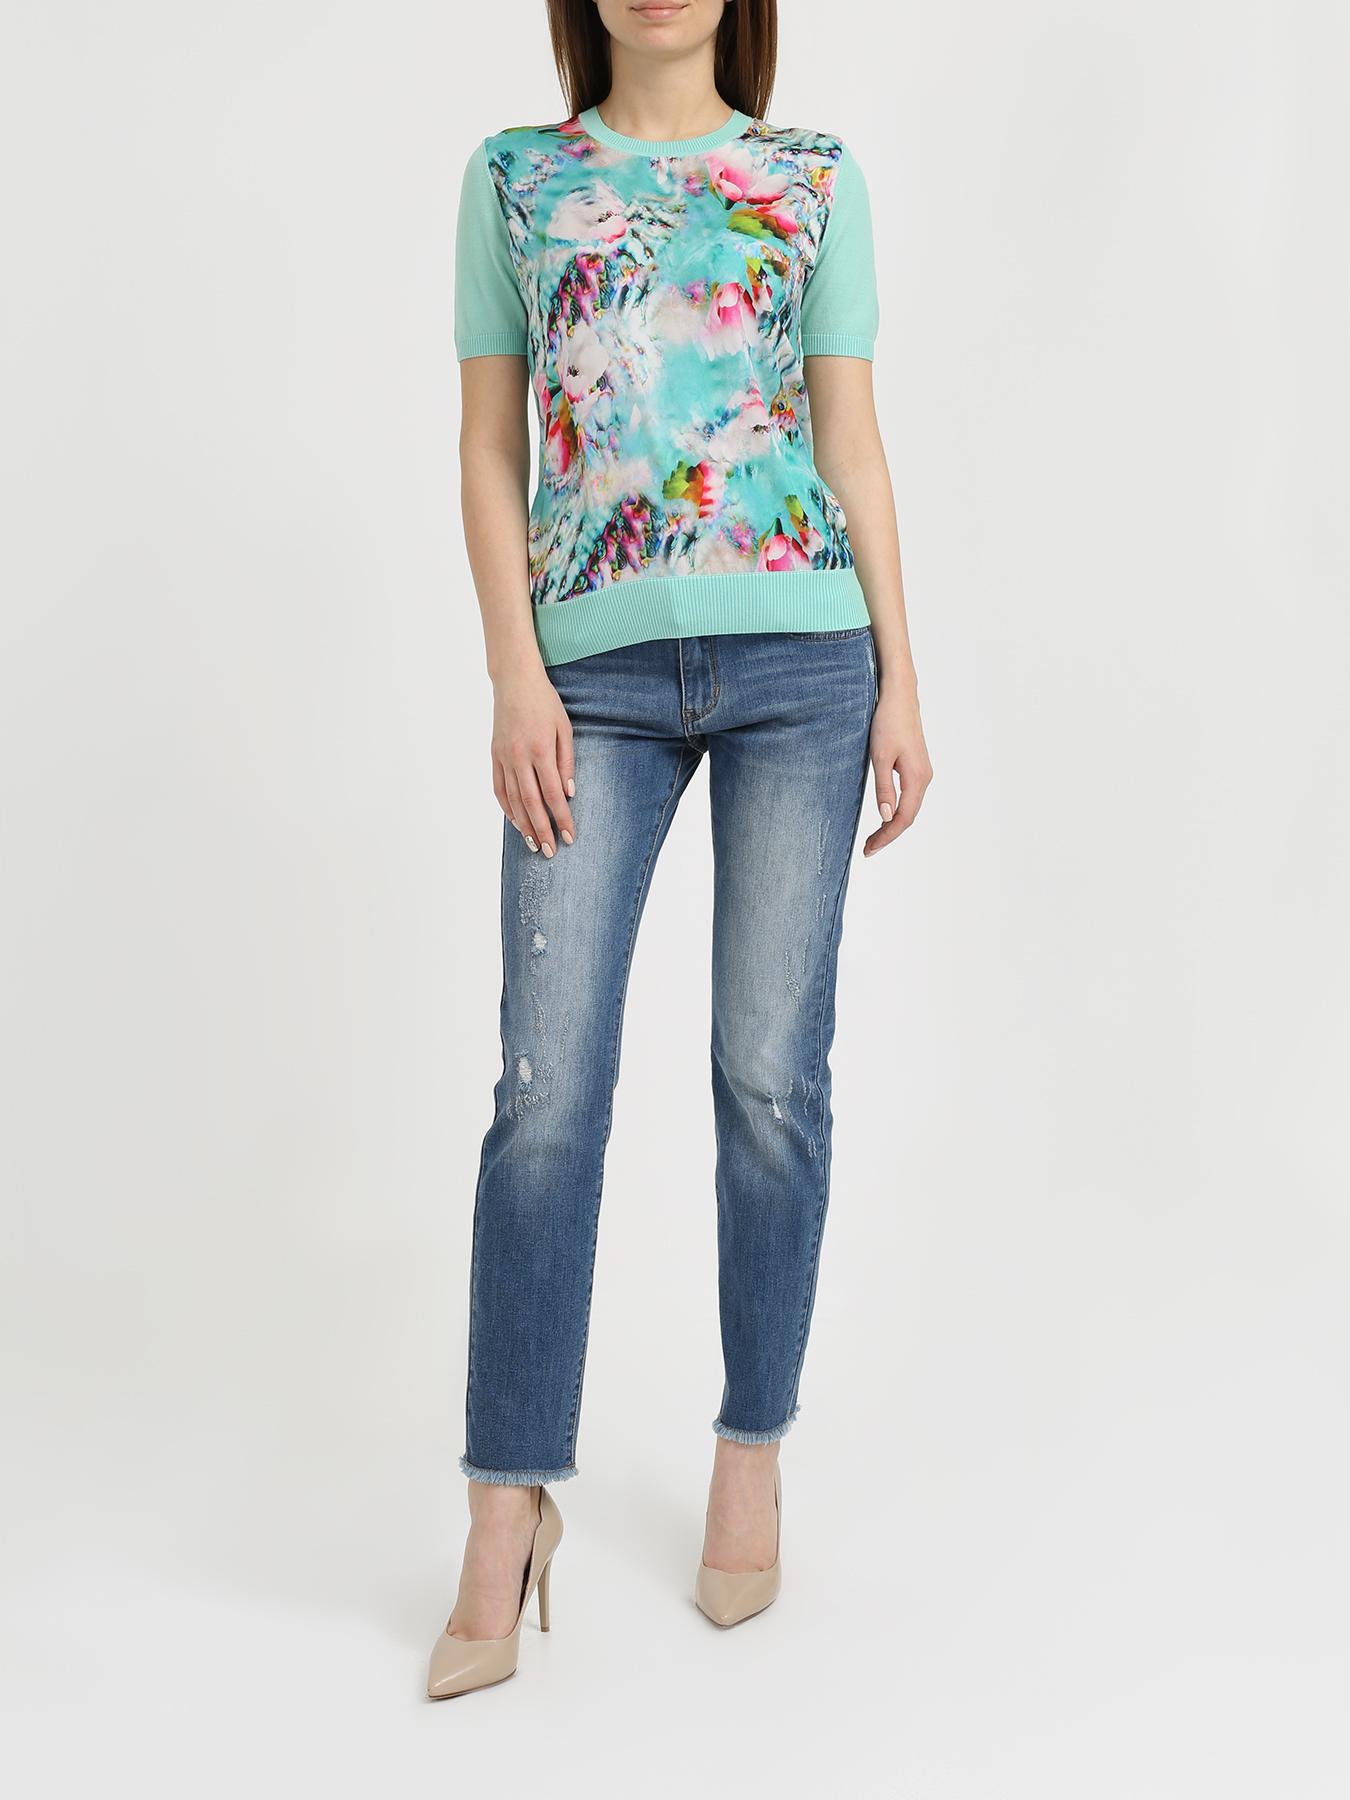 Брюки Korpo Узкие джинсы брюки korpo прямые джинсы